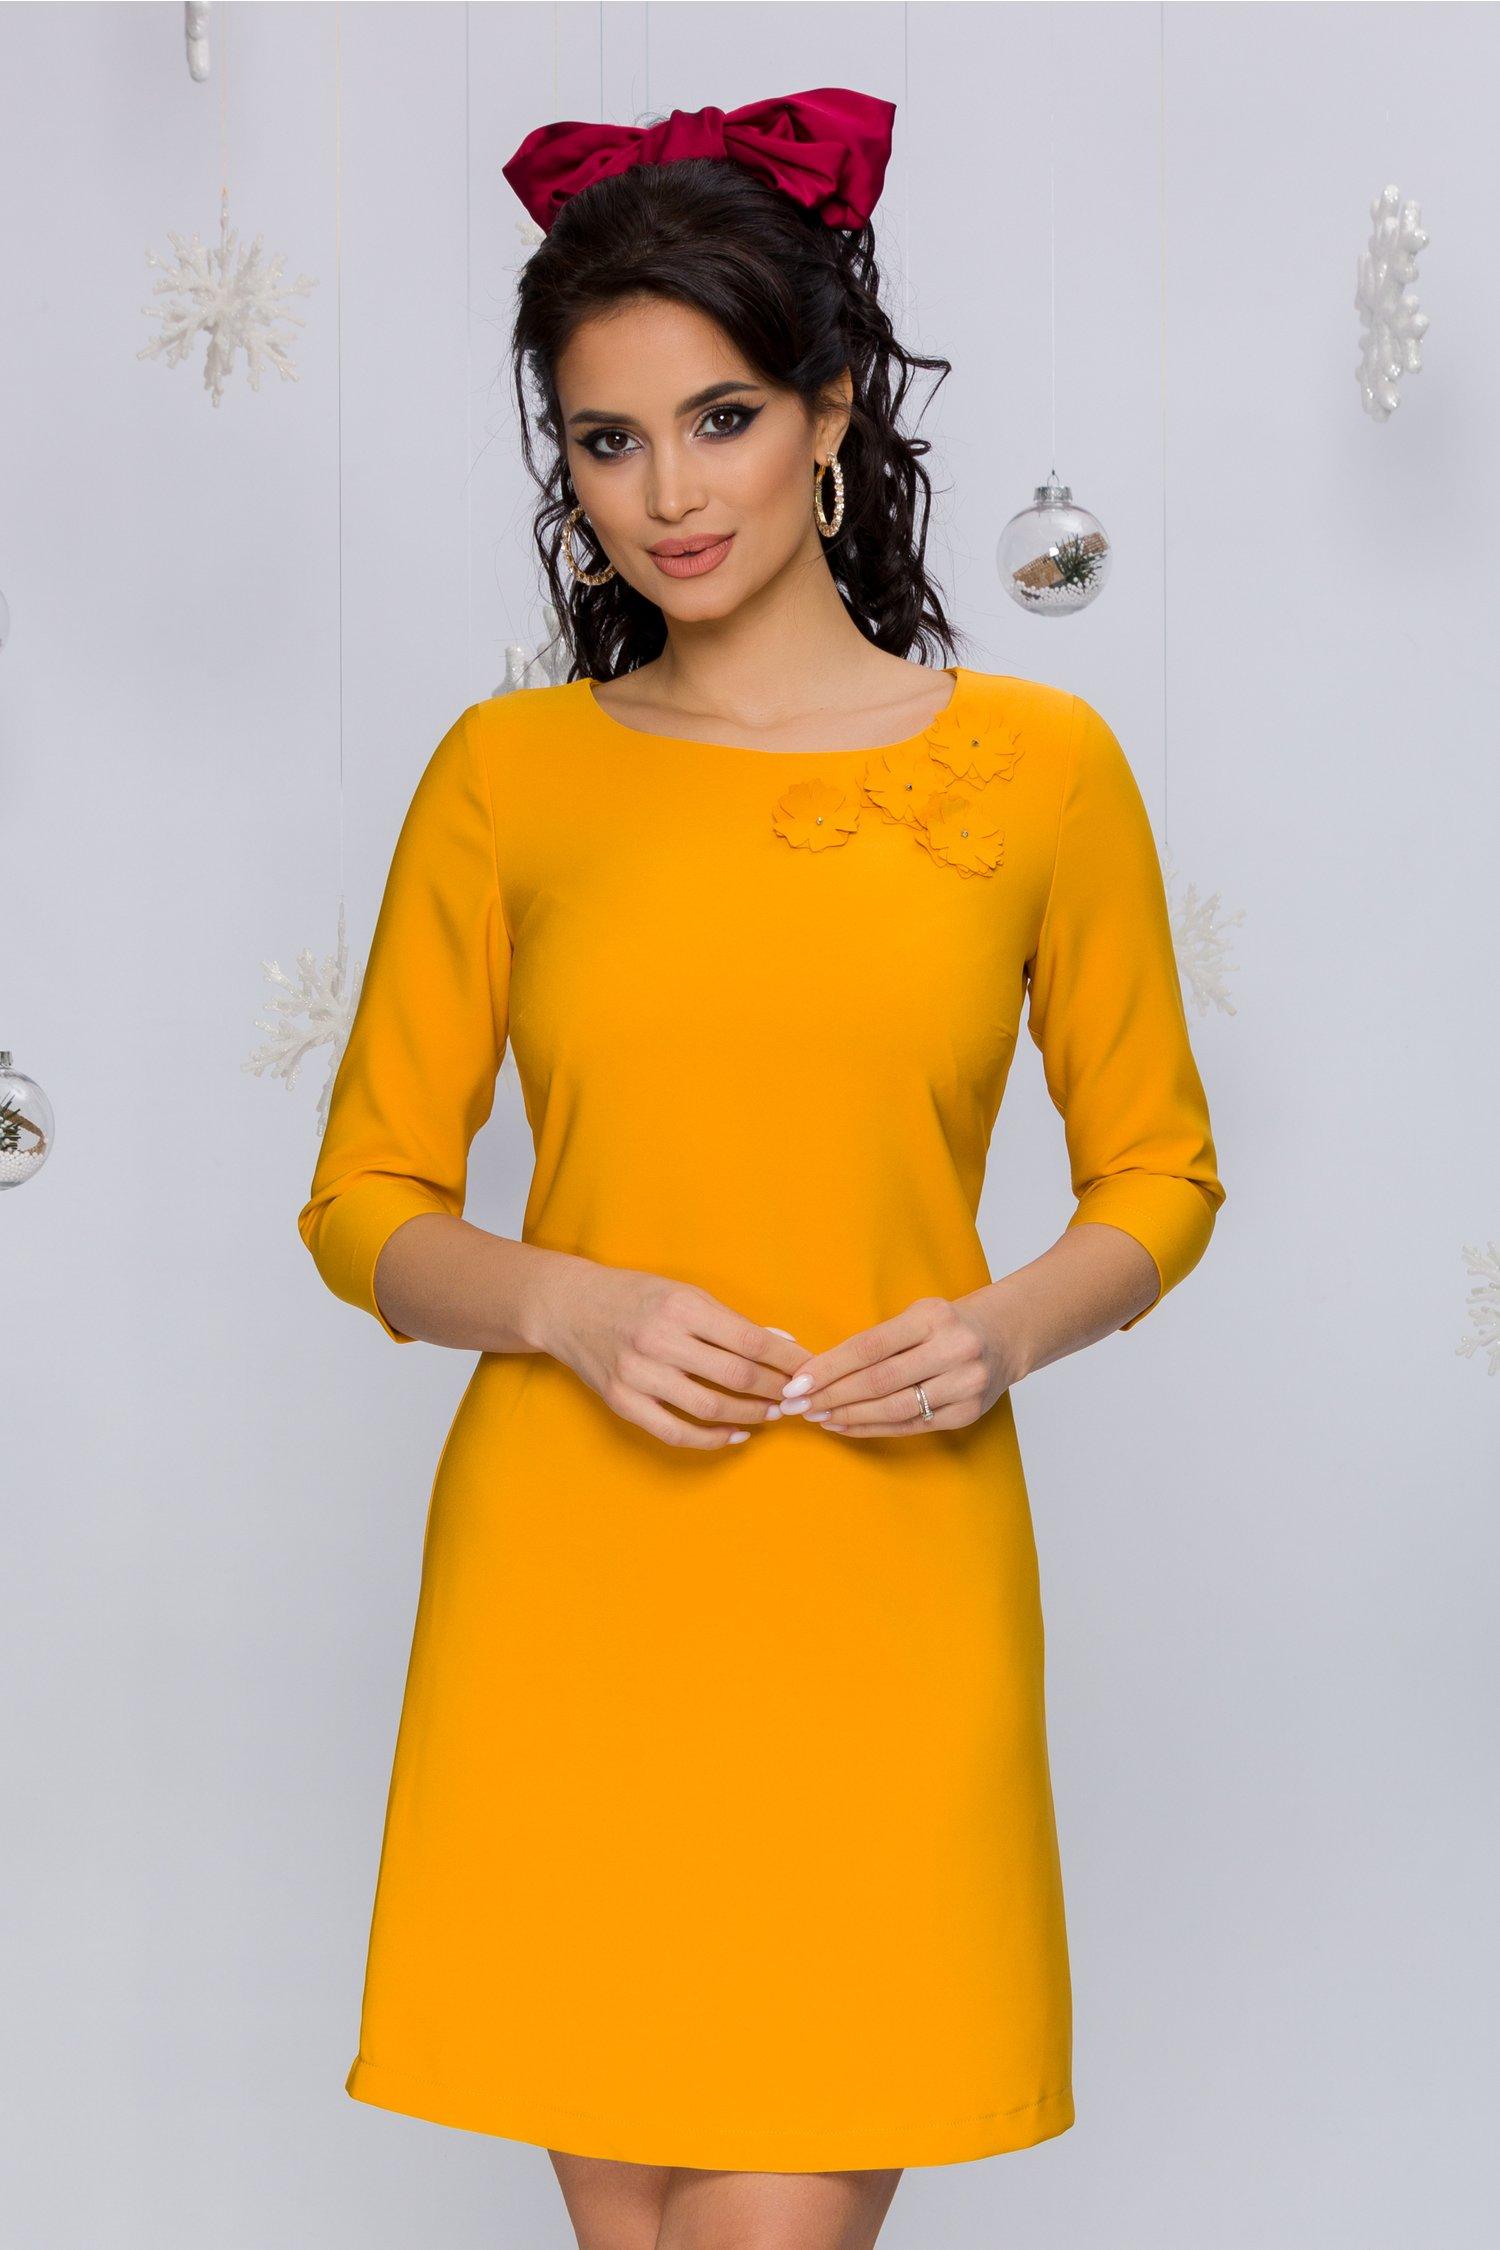 rochie alexa galben mustar evazata cu flori 3d la decolteu 474366 4